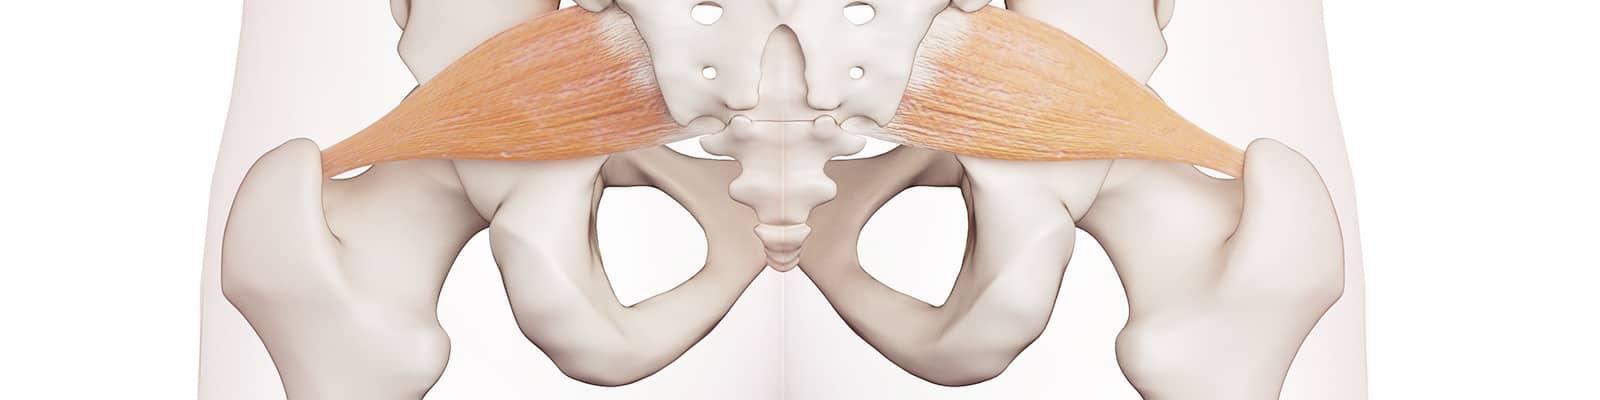 Osteopatía de pubis - Pubalgia